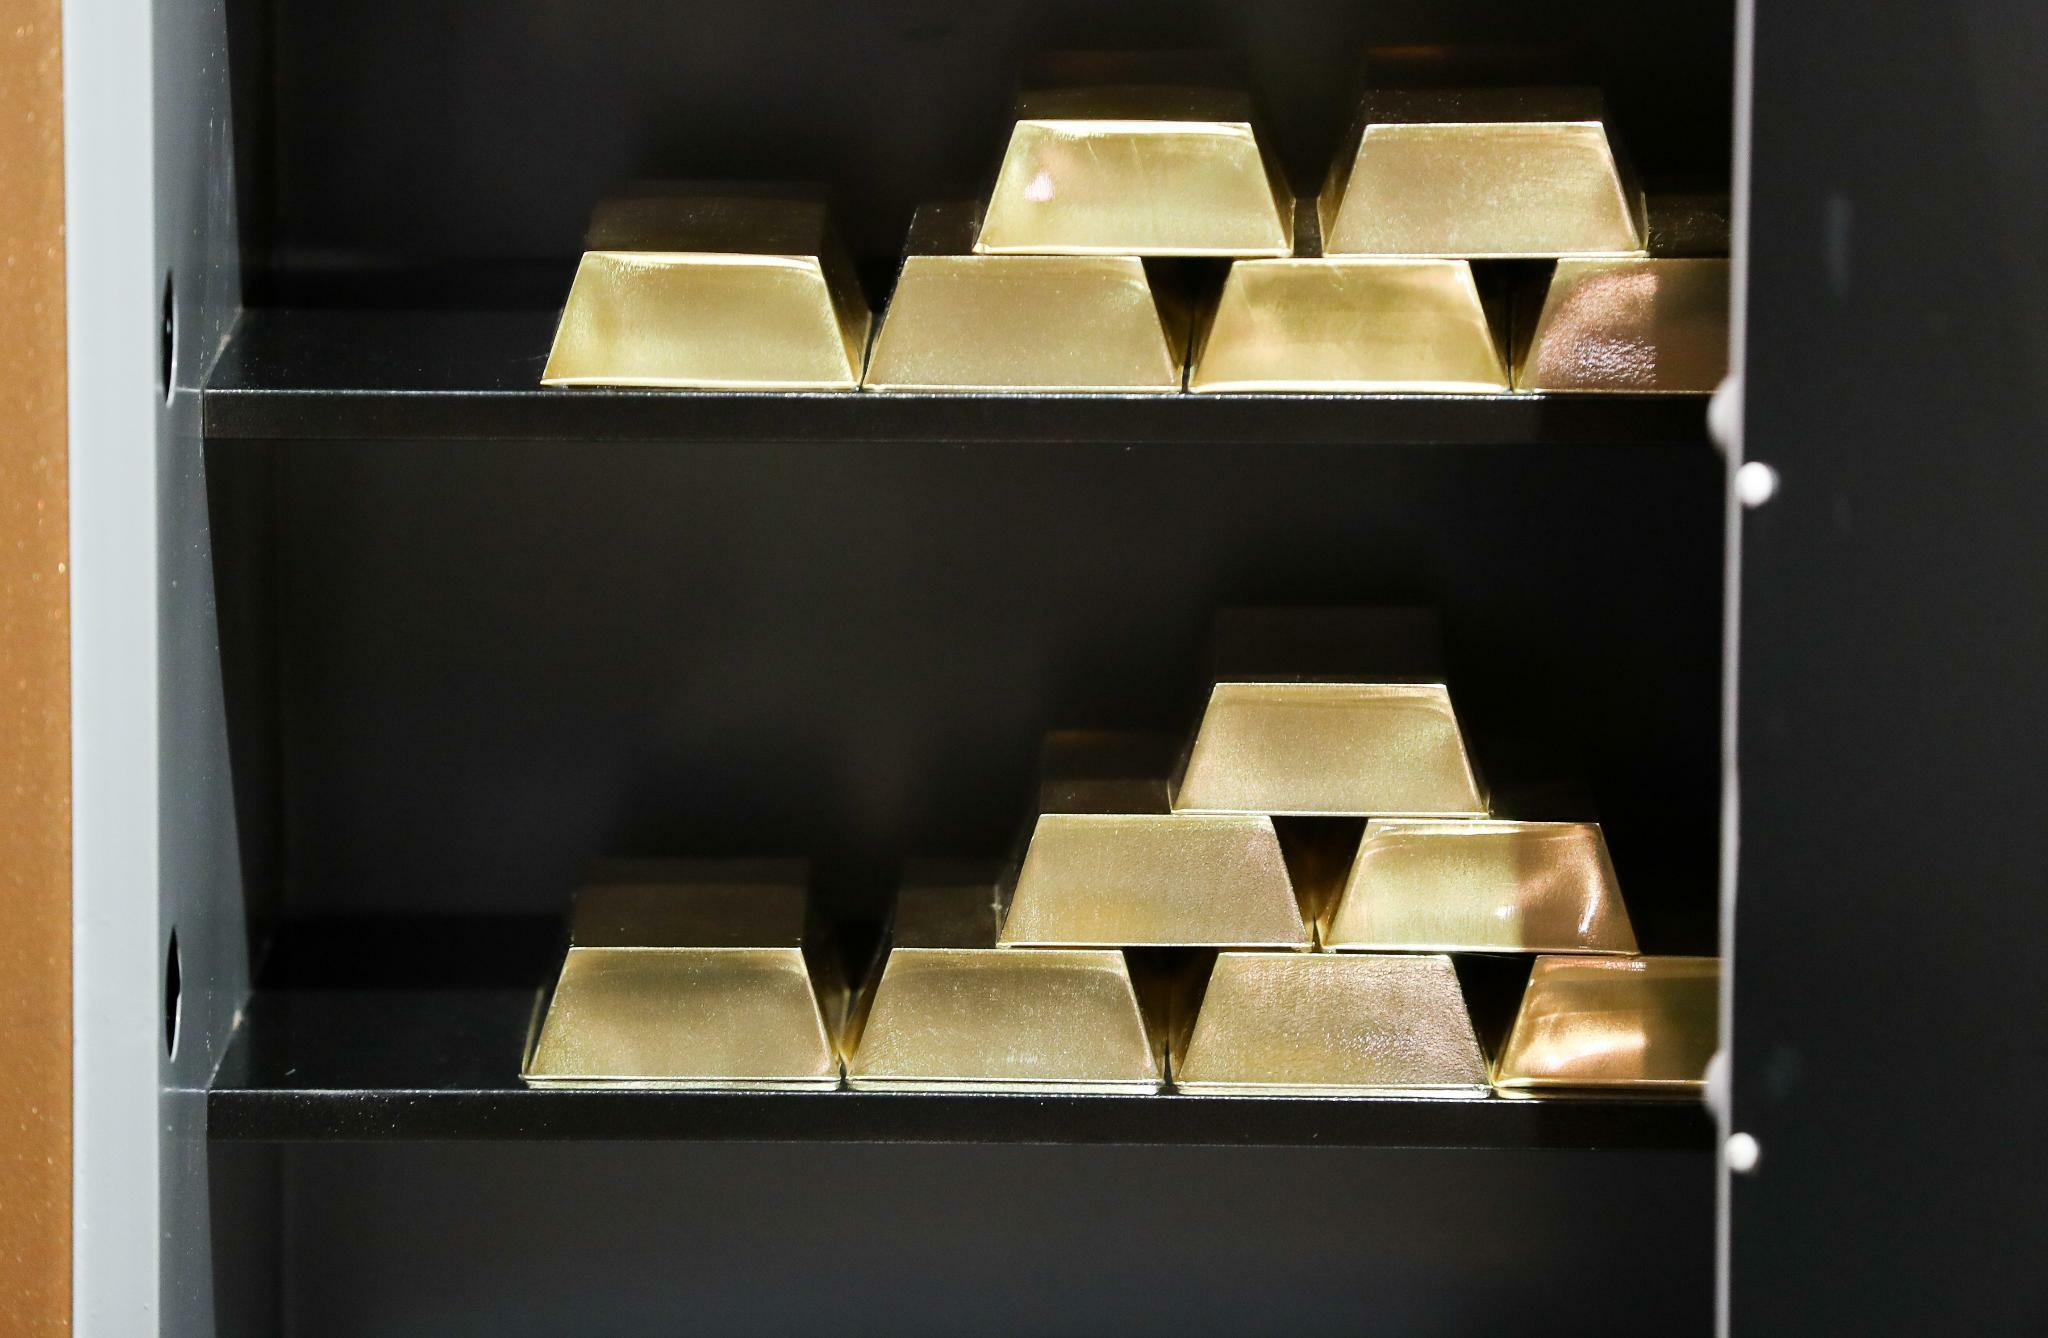 PIM Gold: Staatsanwaltschaft vermisst 1,9 Tonnen Gold